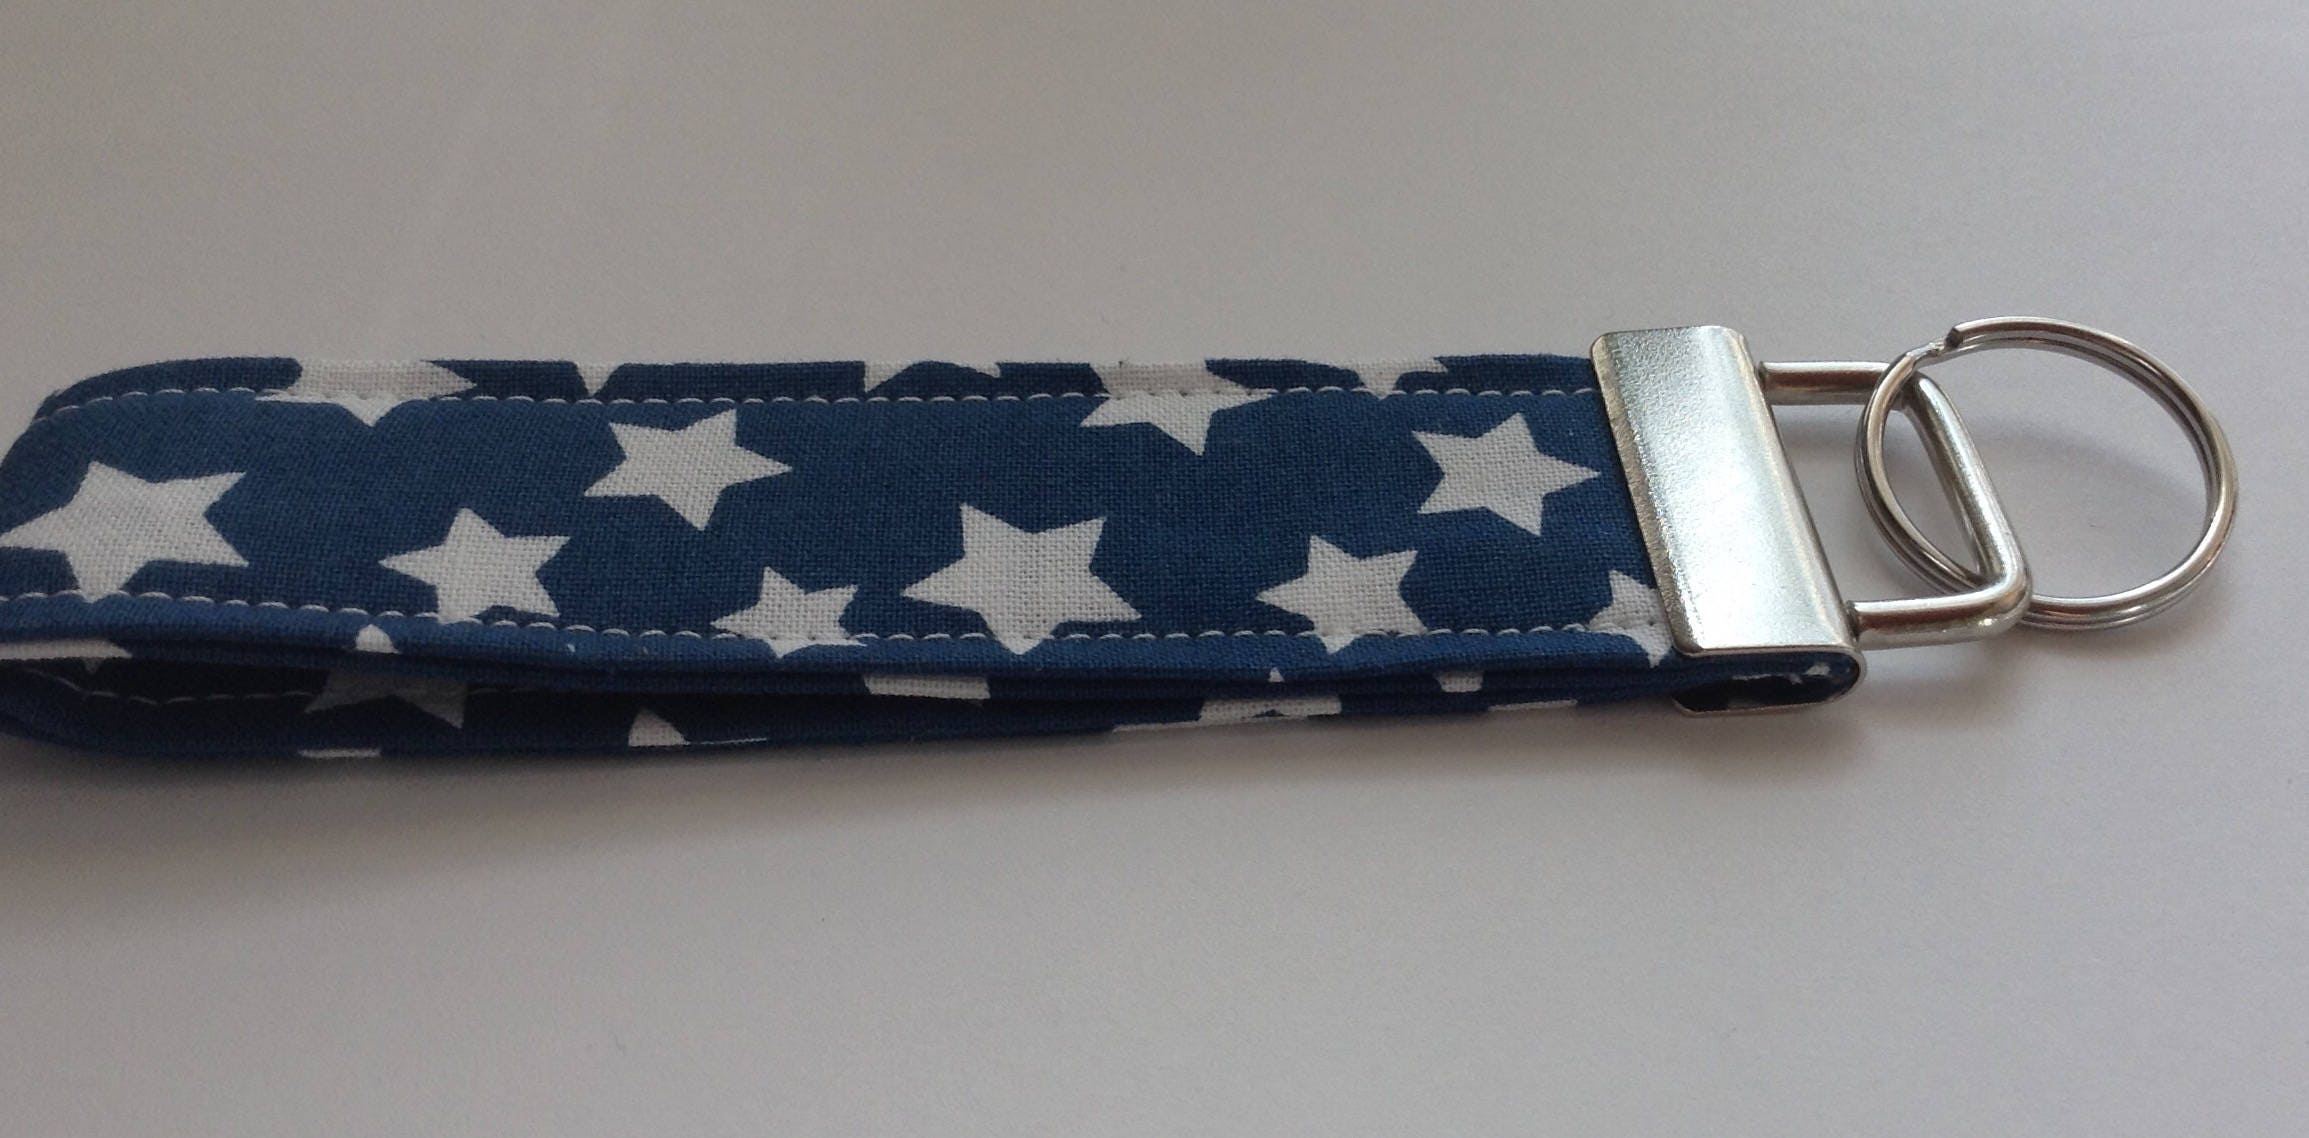 wristlet keychain key fob key ring fabric keychain women s girls  accessories- blue stars fabric 5ed3a346e